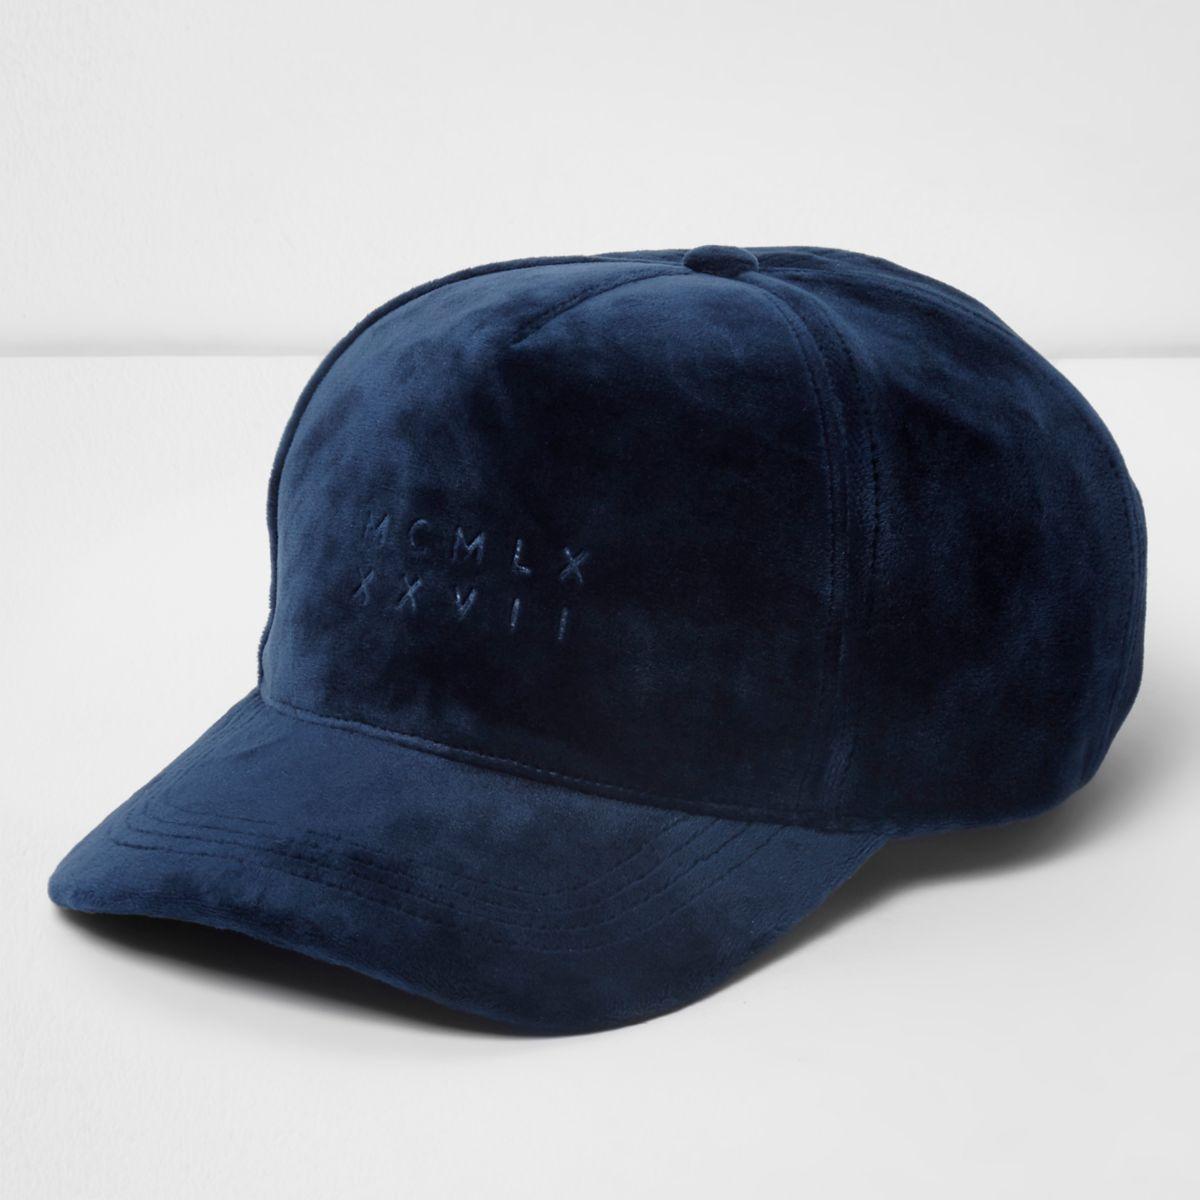 Blaue, samtige Baseballkappe